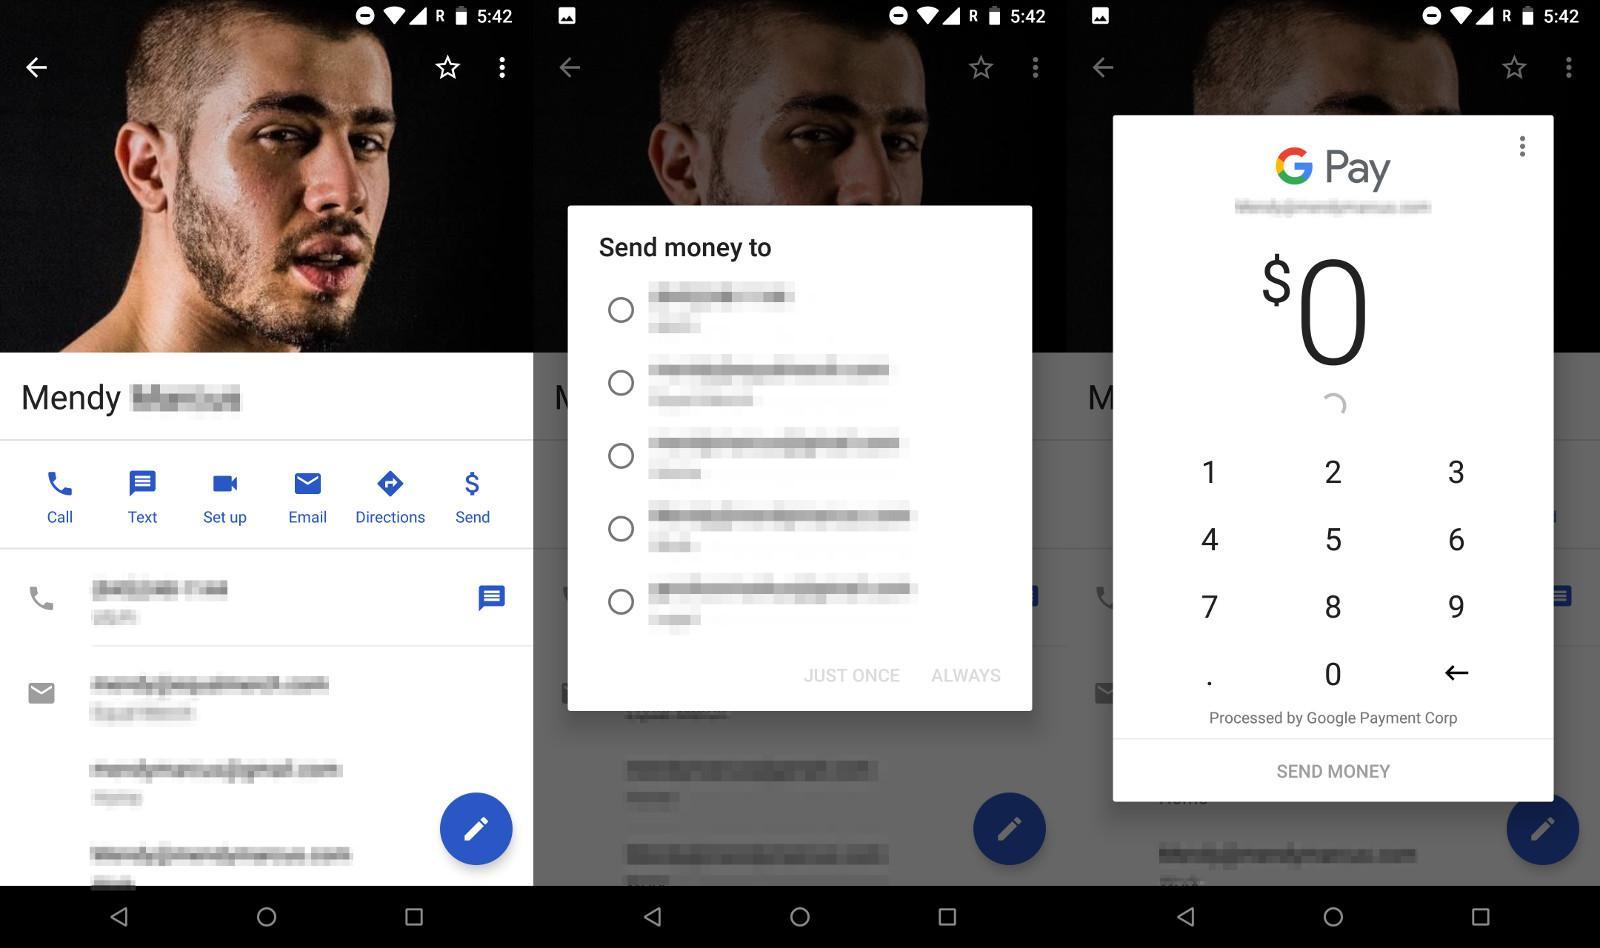 Google Contacts can send money via Google Pay Send - SlashGear